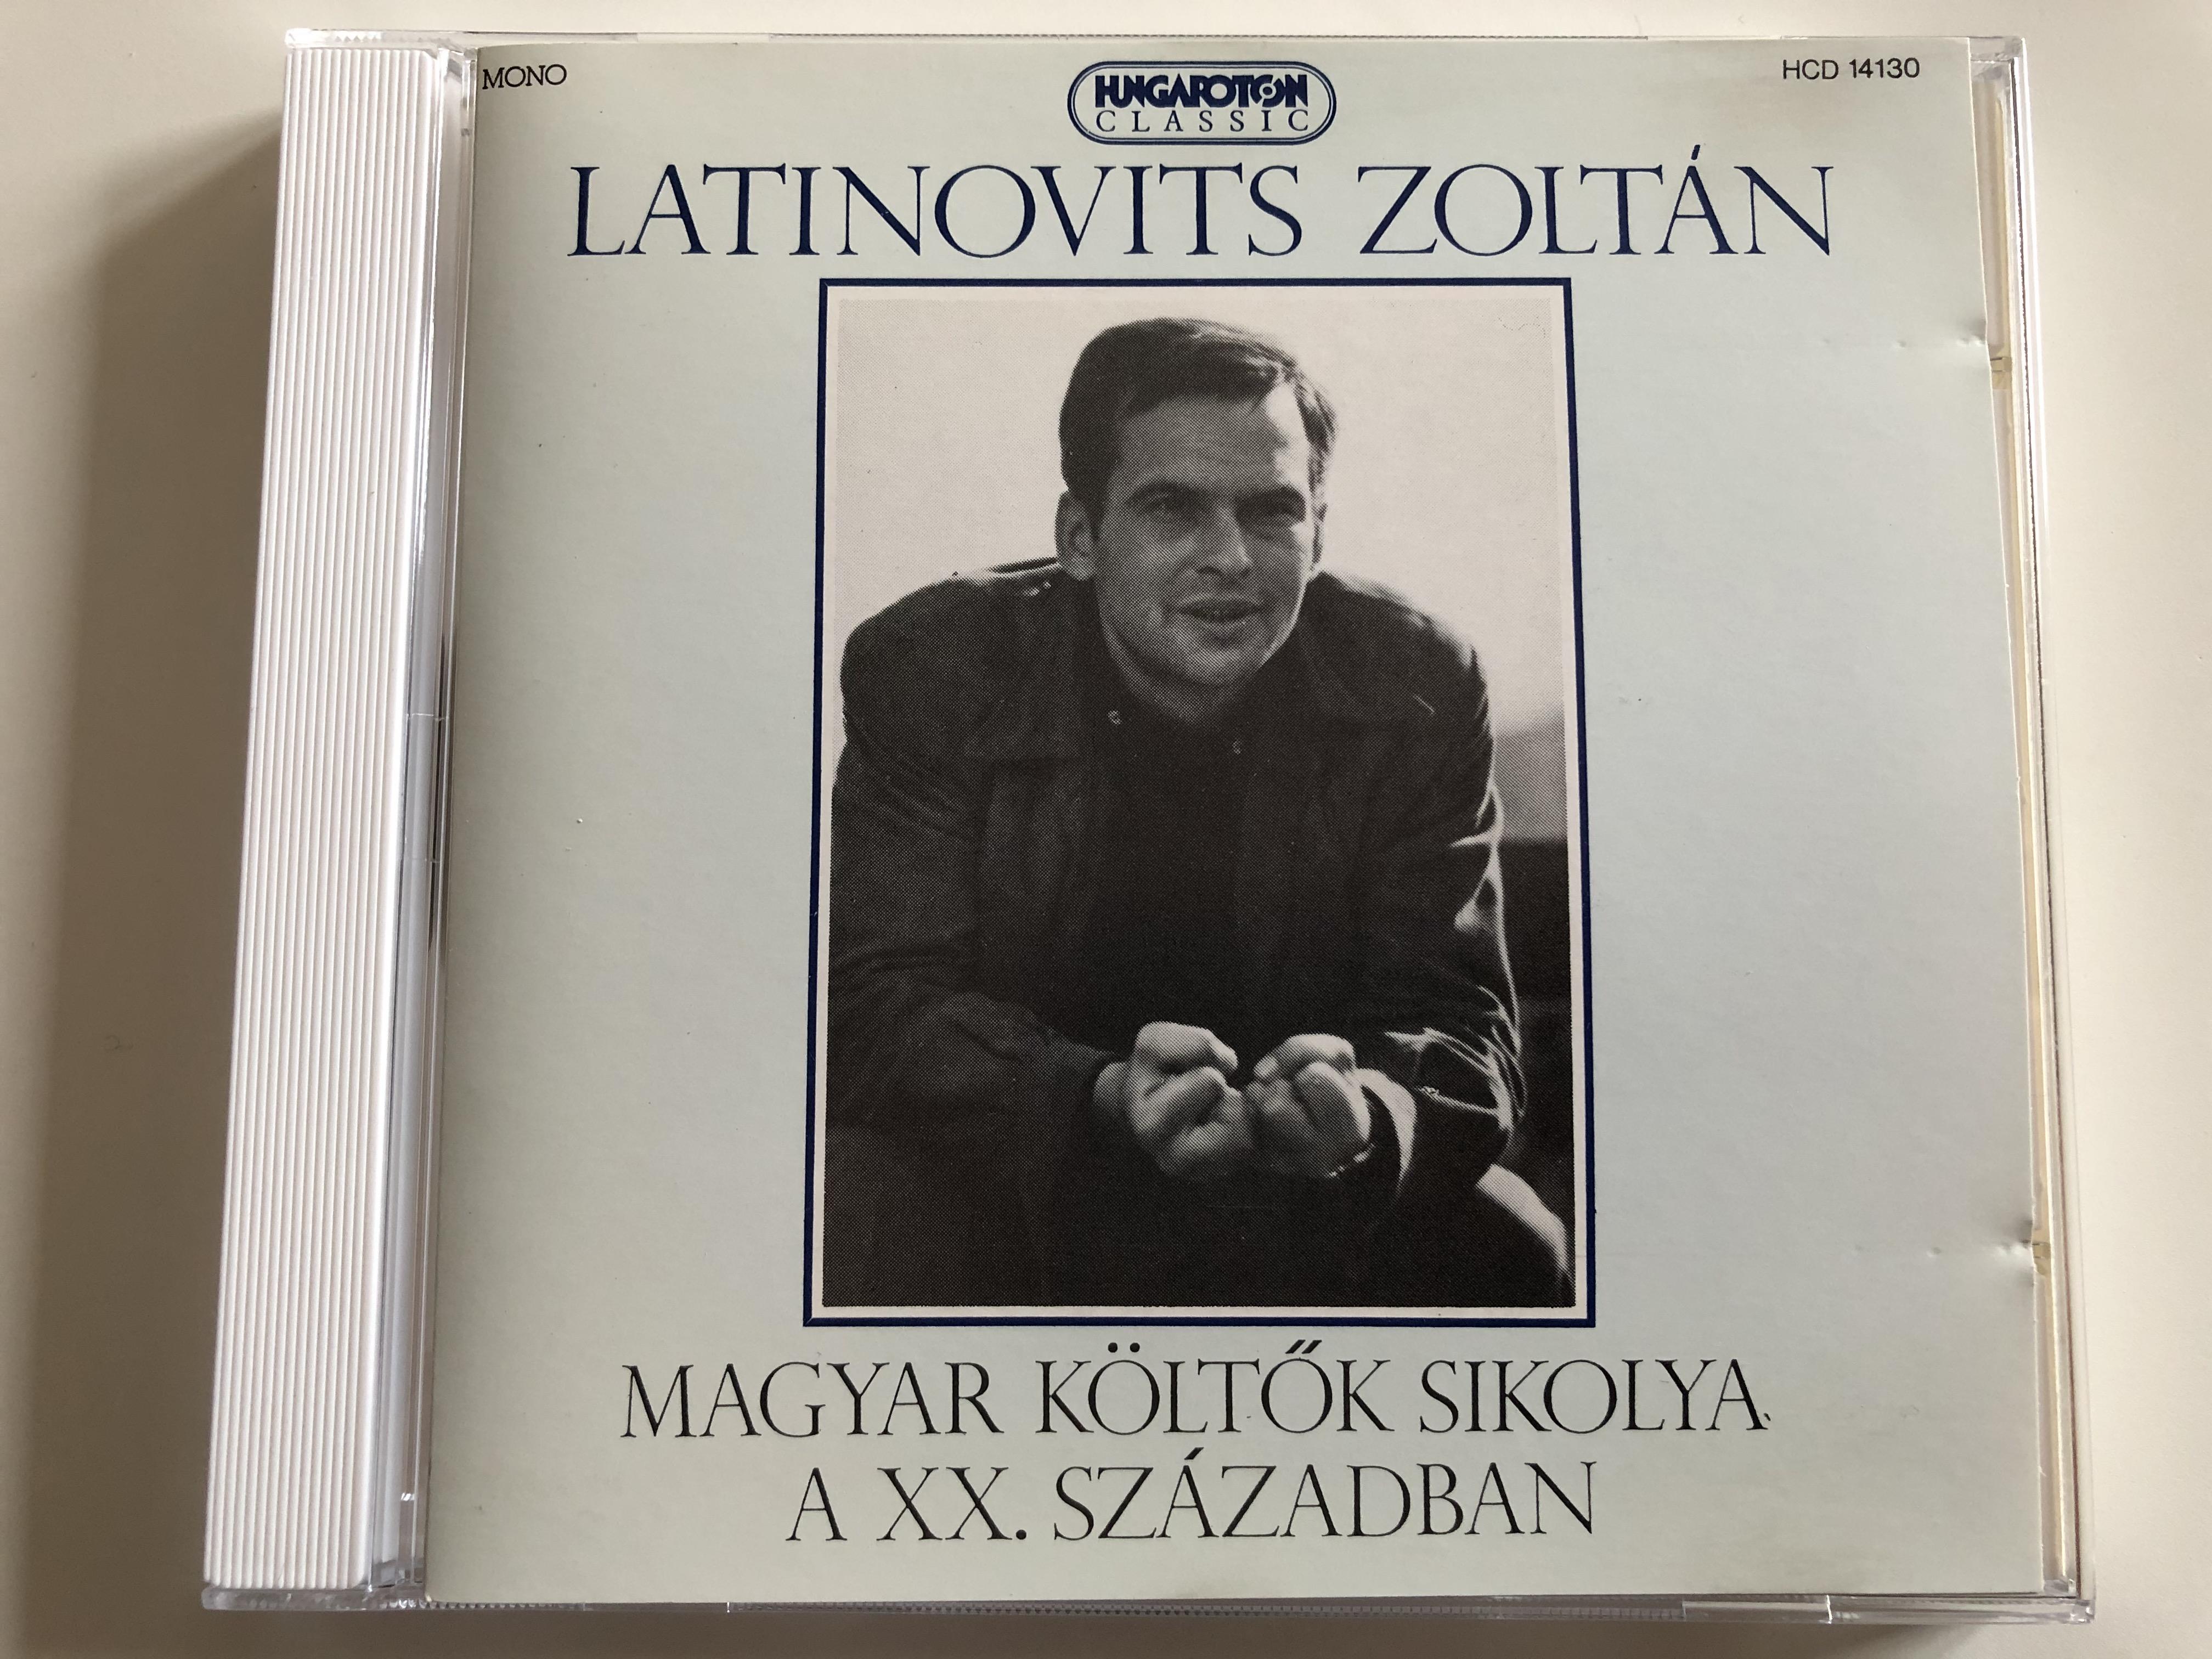 latinovits-zolt-n-magyar-k-lt-k-sikolya-a-xx.-sz-zadban-hungaroton-classic-audio-cd-1994-mono-hcd-14130-1-.jpg